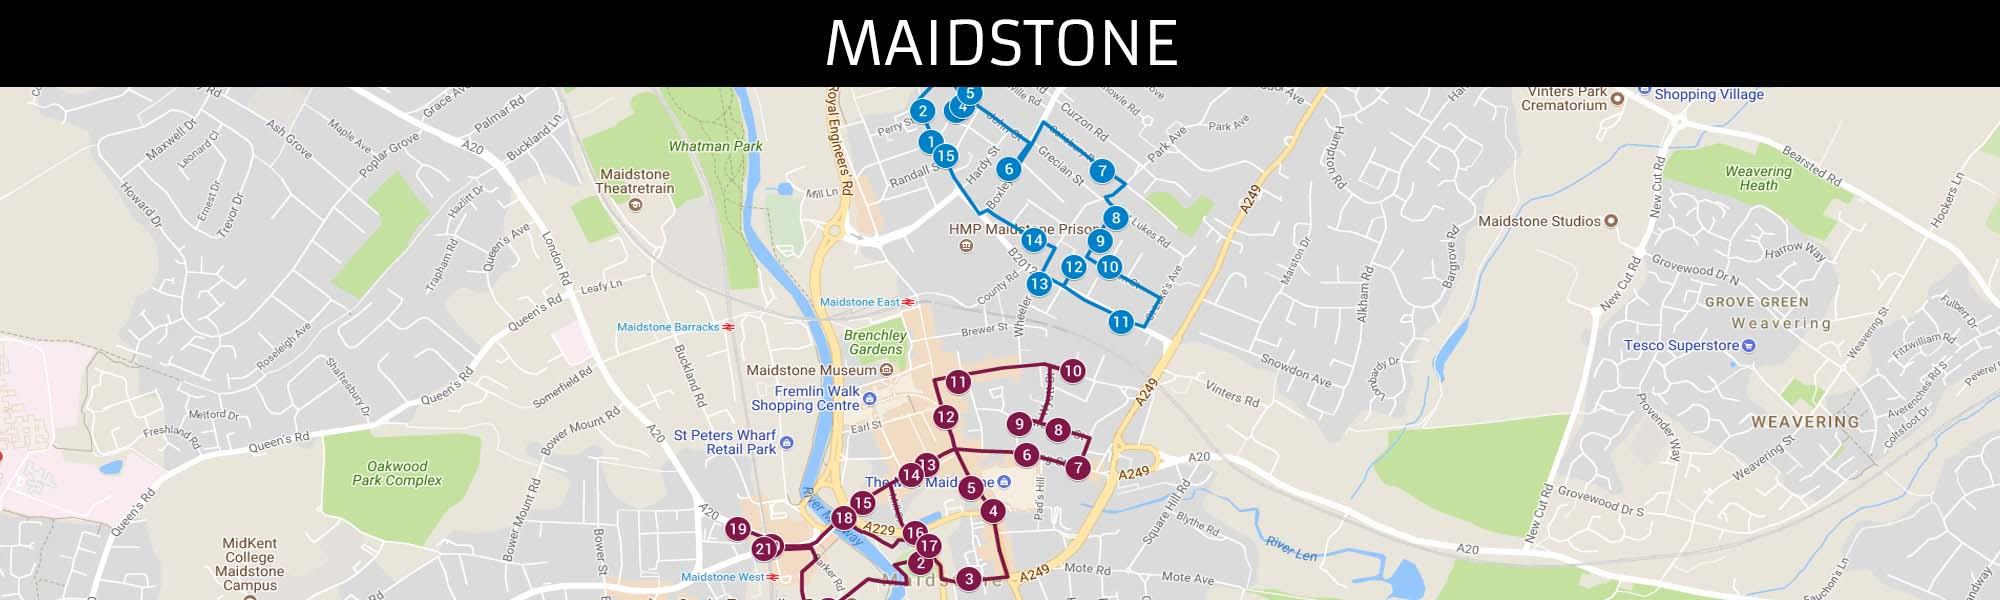 Maidstone Trail